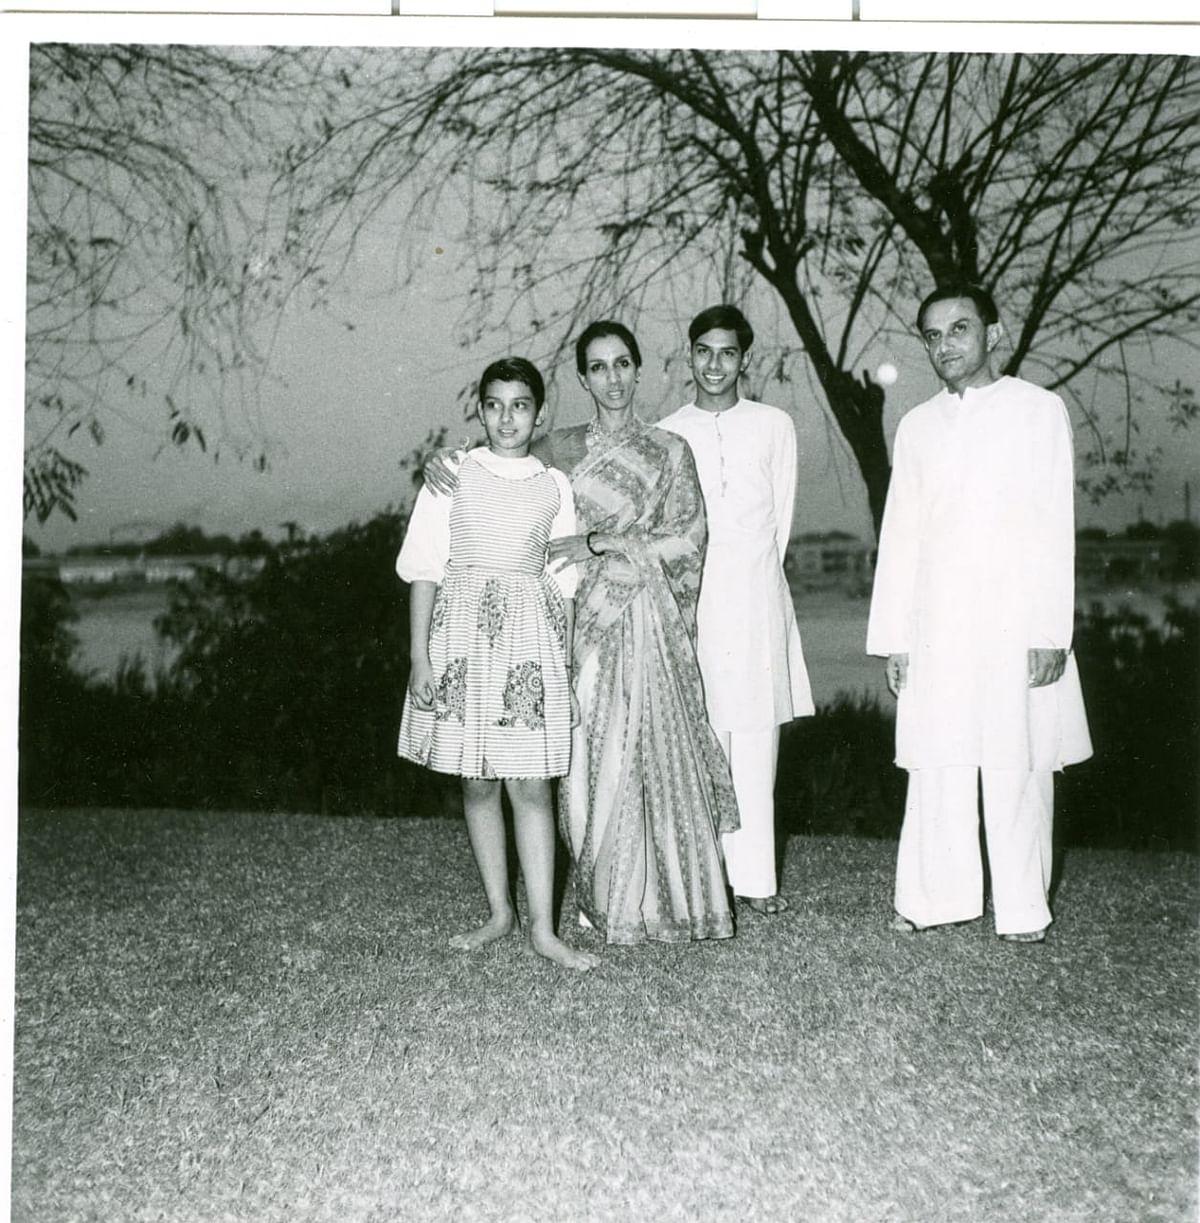 The Sarabhai Family (L to R): Mallika, Mrinalini, Kartikeya and Vikram